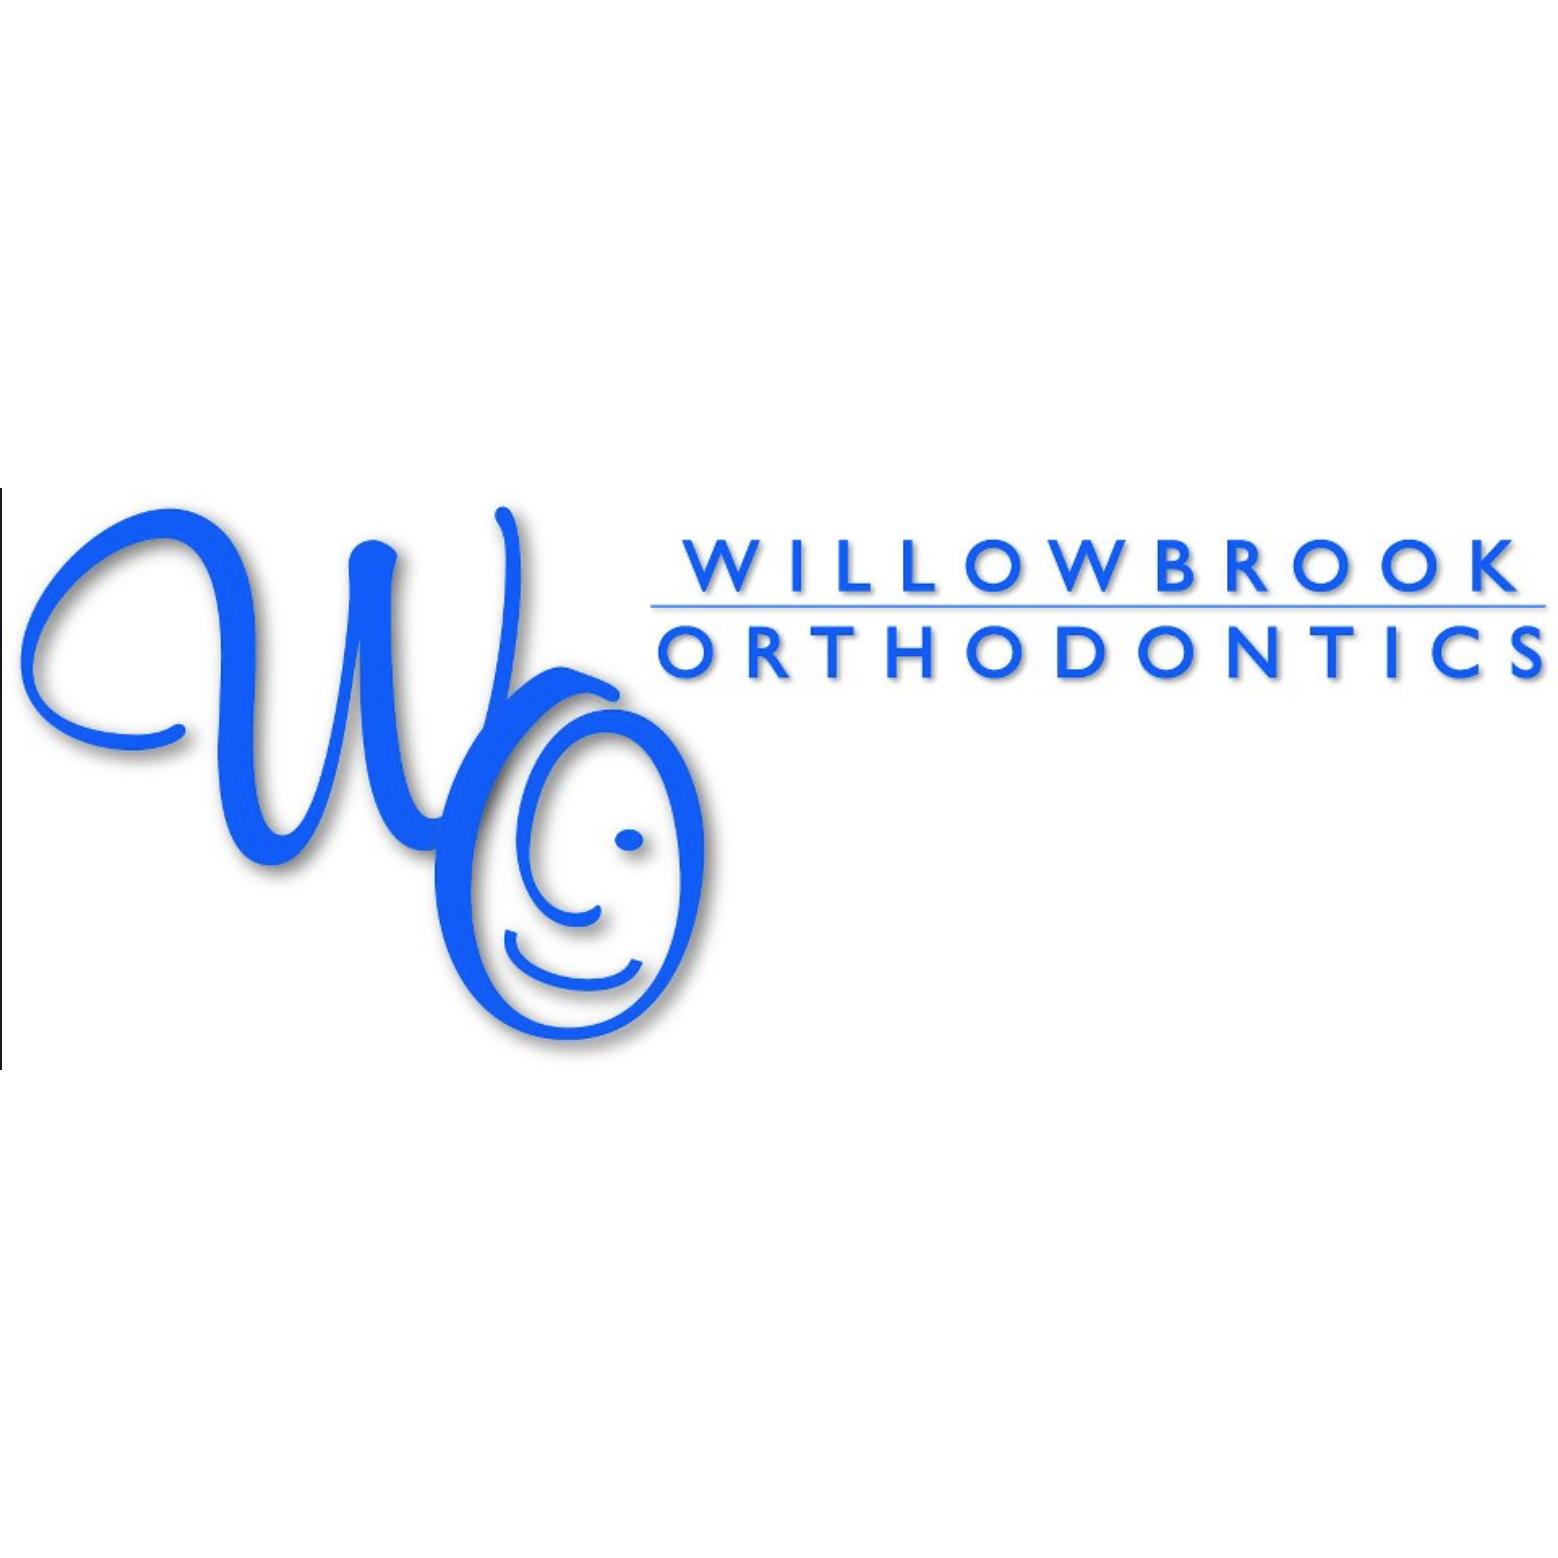 Willowbrook Orthodontics